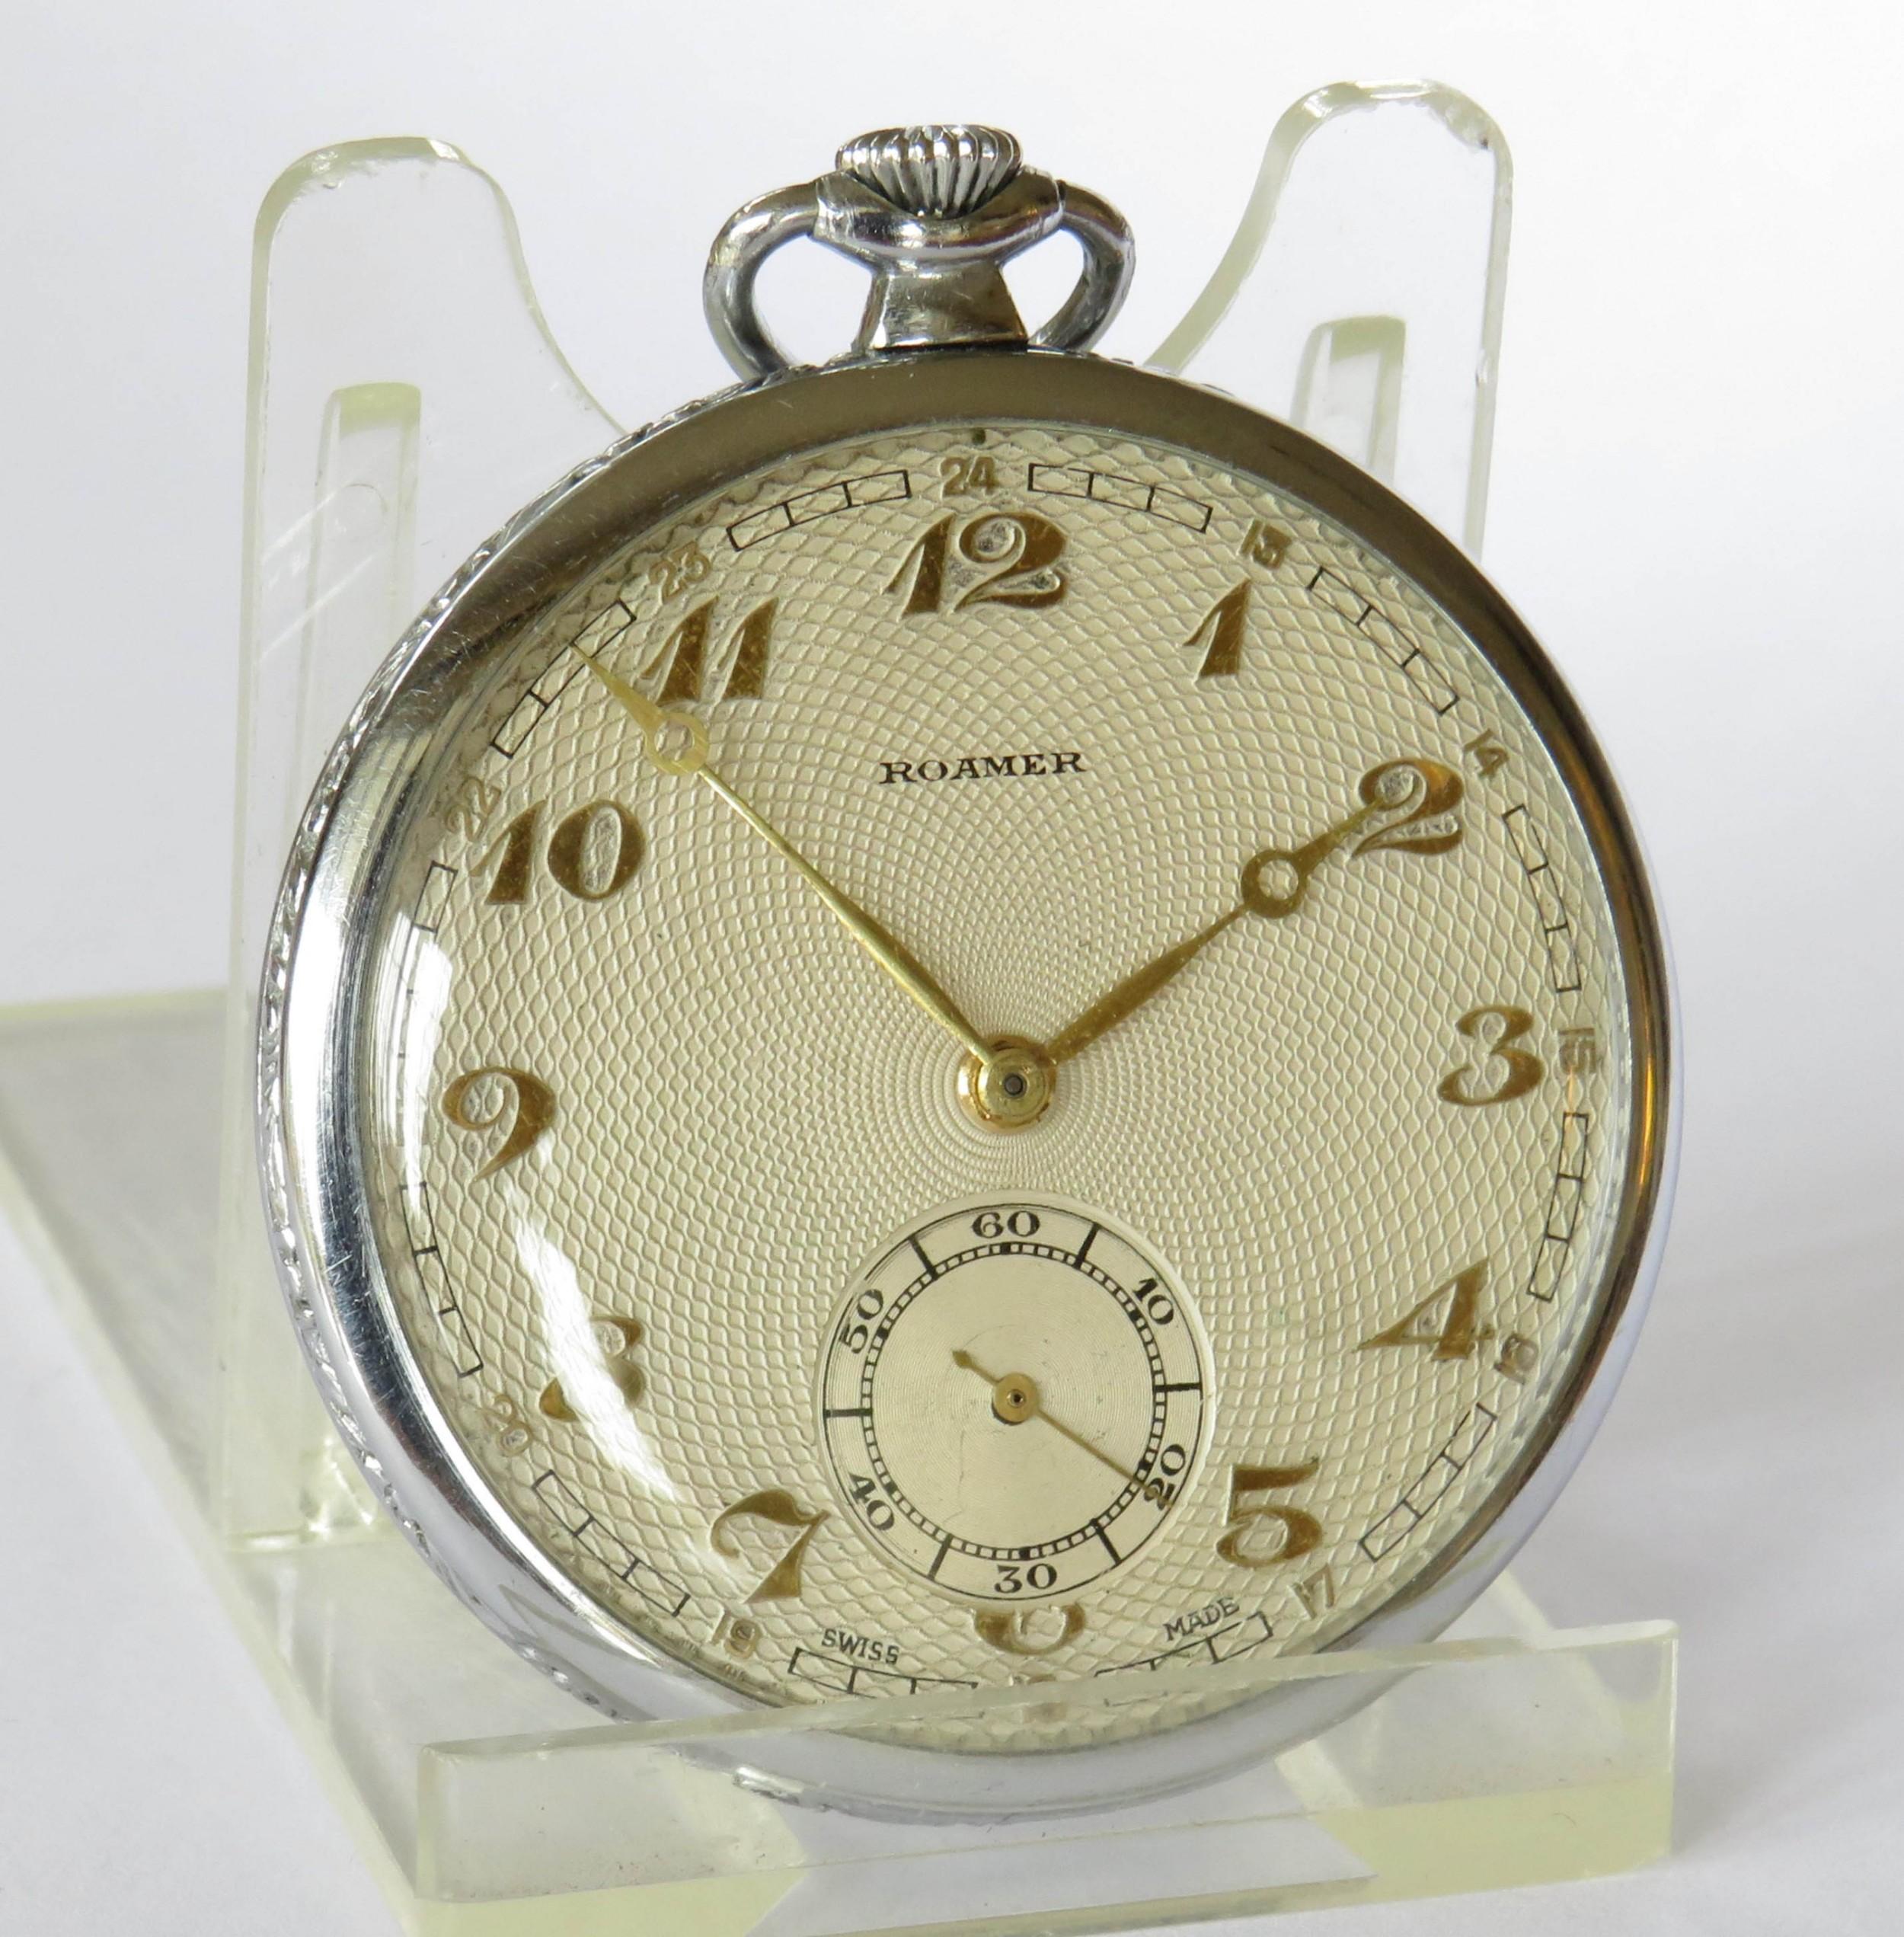 1930s roamer pocket watch